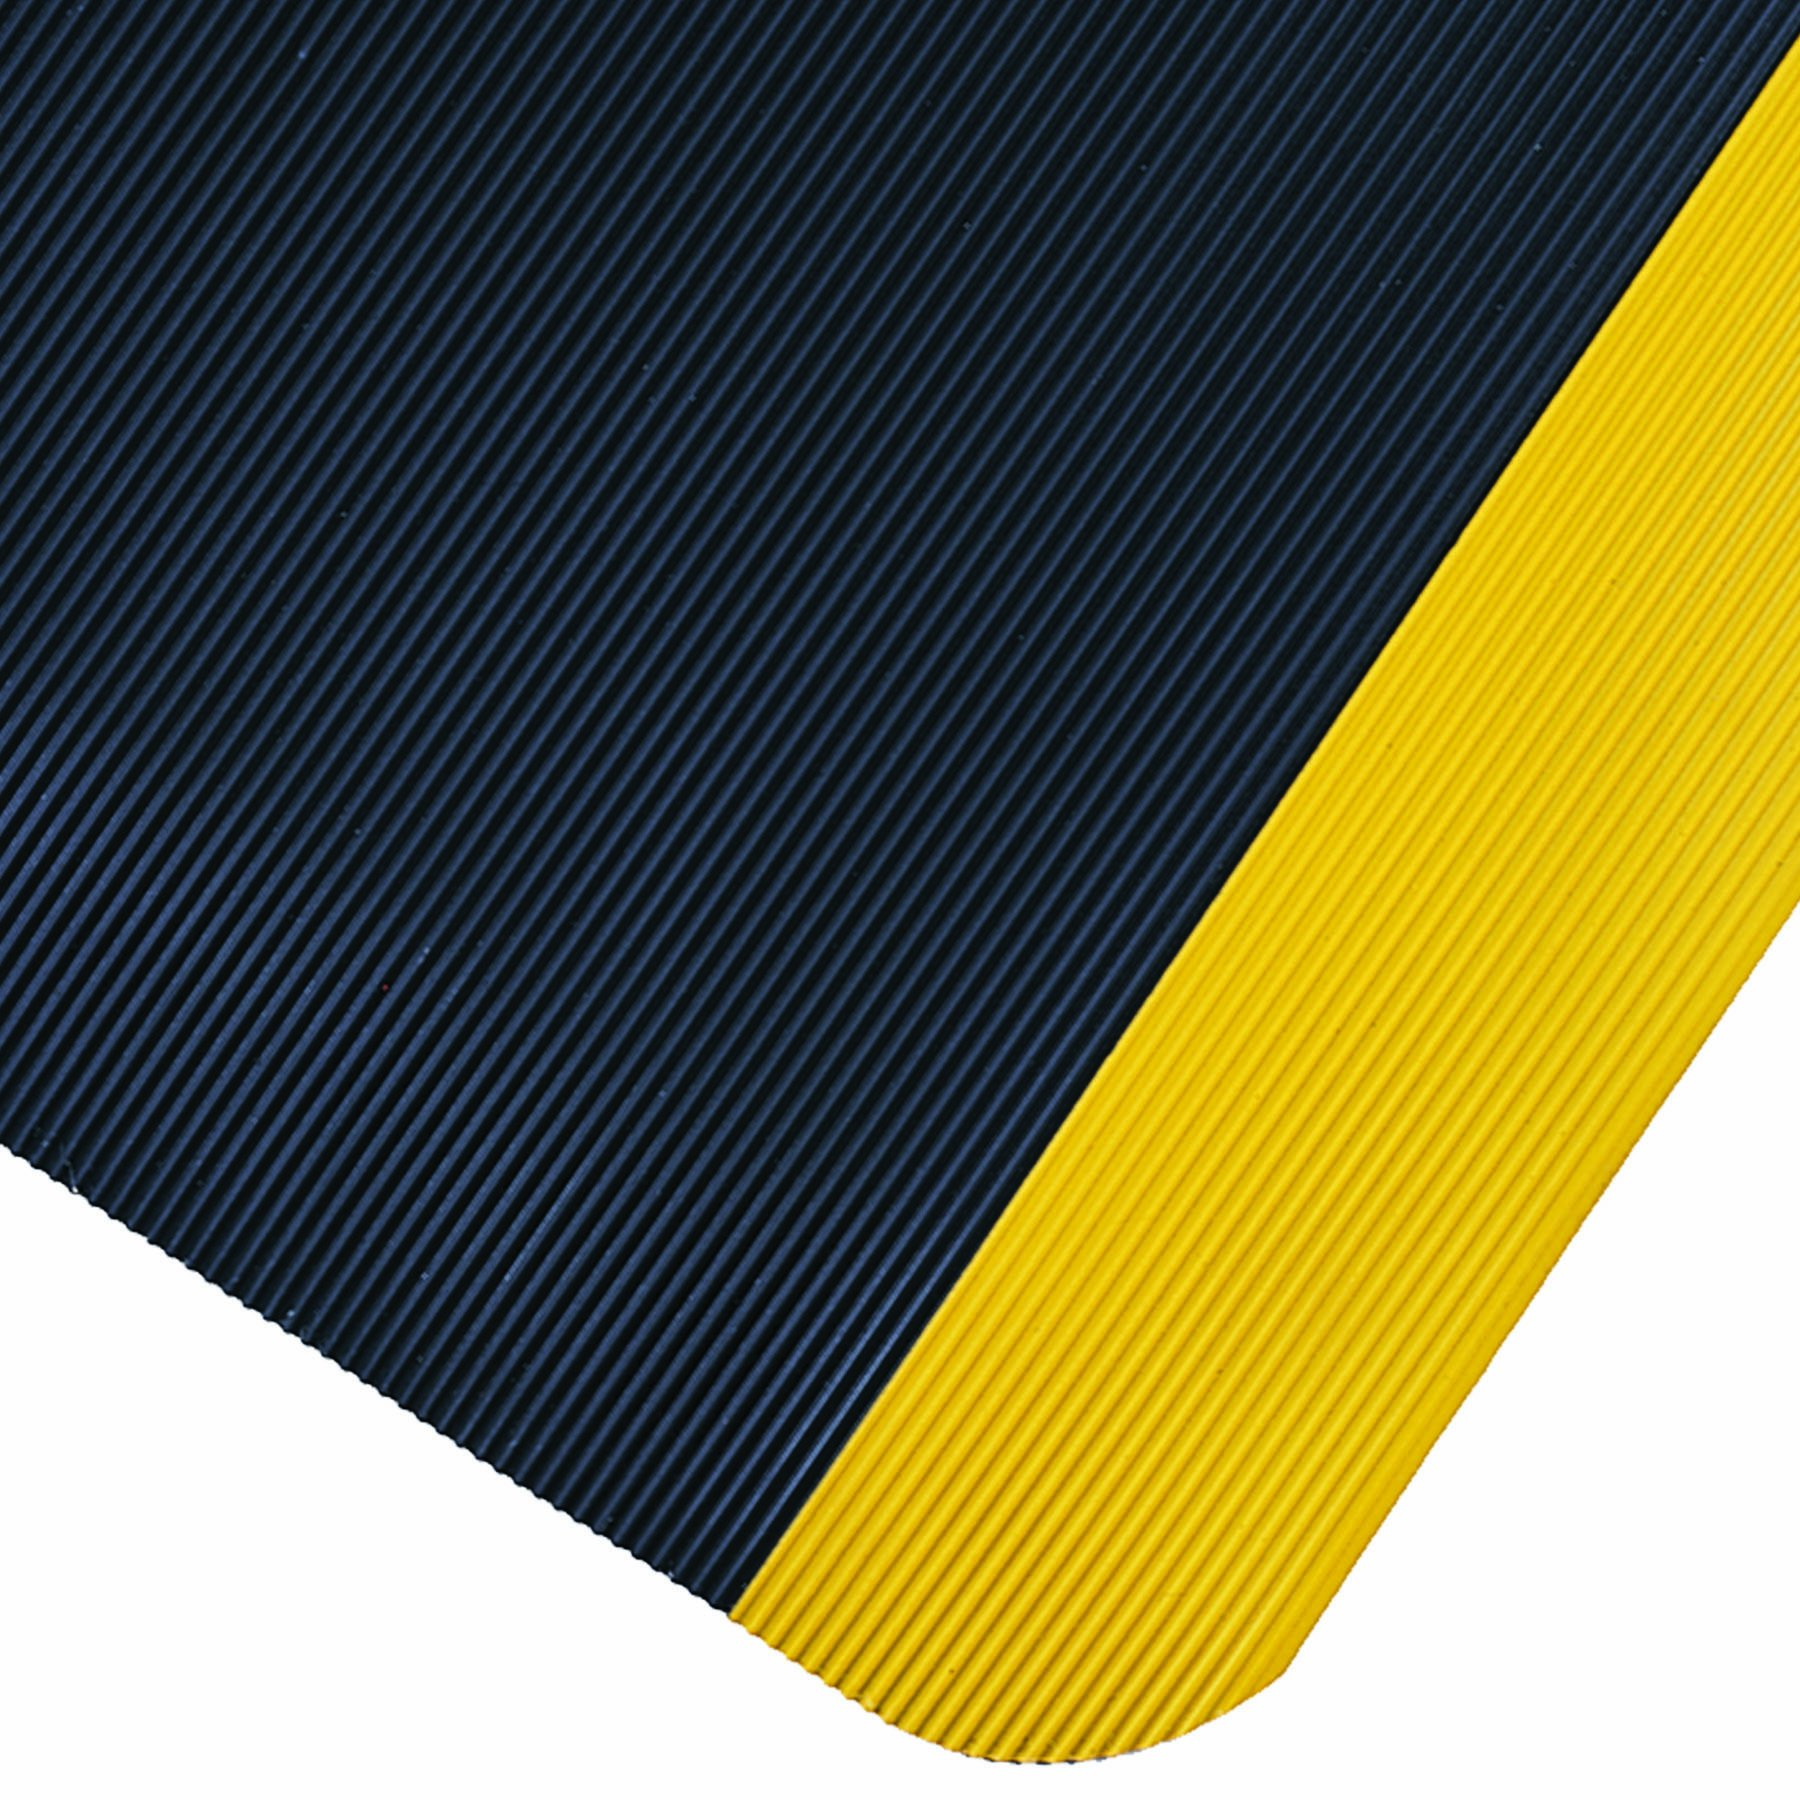 Wearwell PVC 431 SpongeCote Medium Duty Anti-Fatigue Beveled Mat, Corrugated, for Dry Areas, 3' Width x 5' Length x 7/8'' Thickness, Black/Yellow